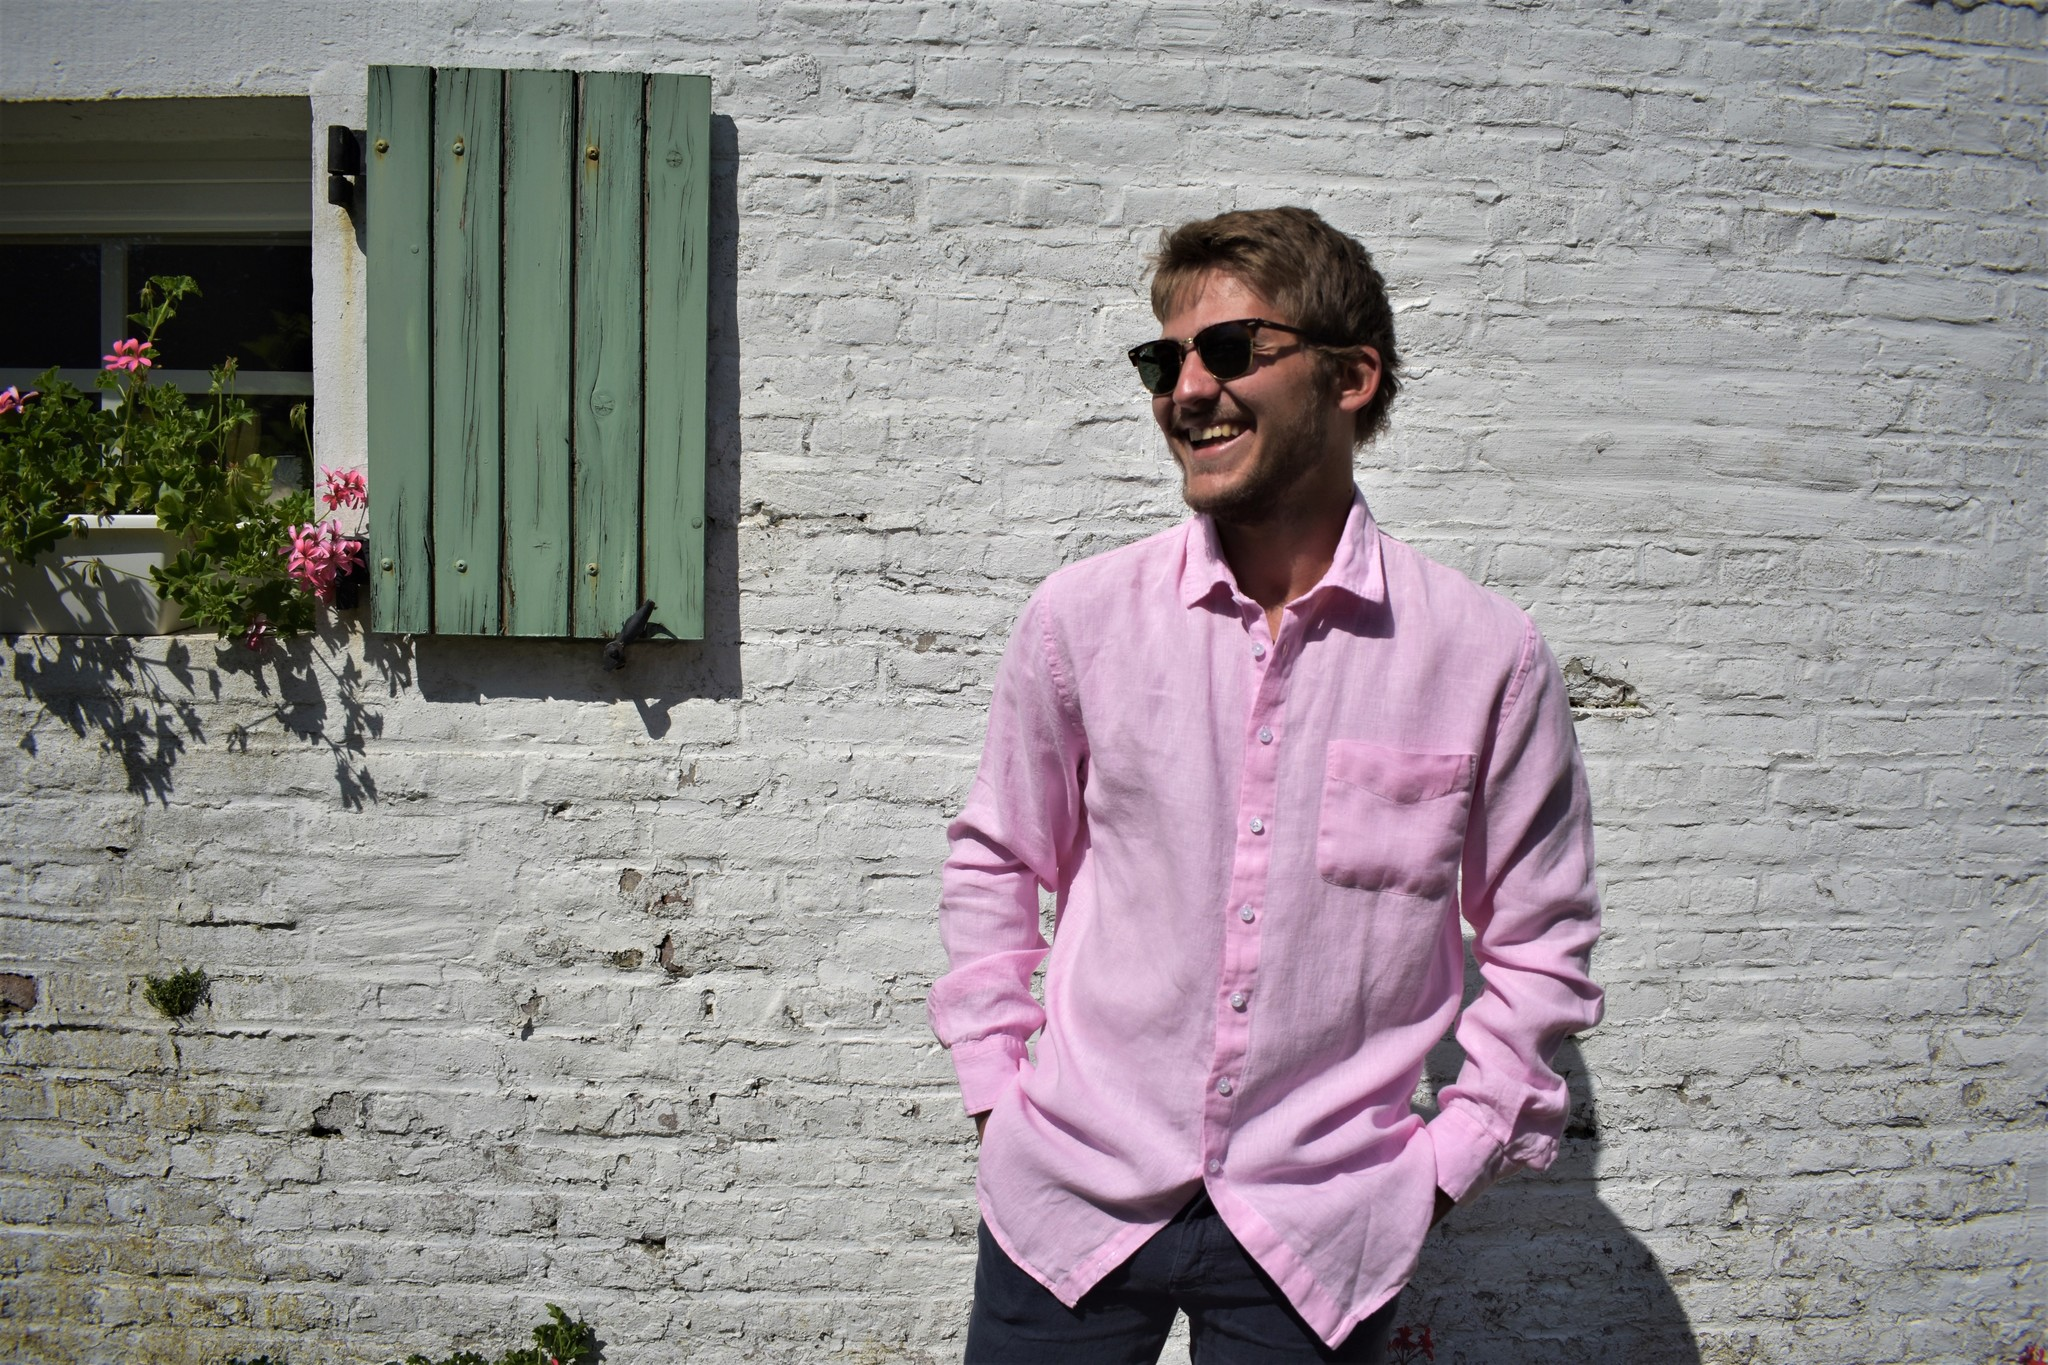 Le grenier du lin Long-sleeved shirt Pink